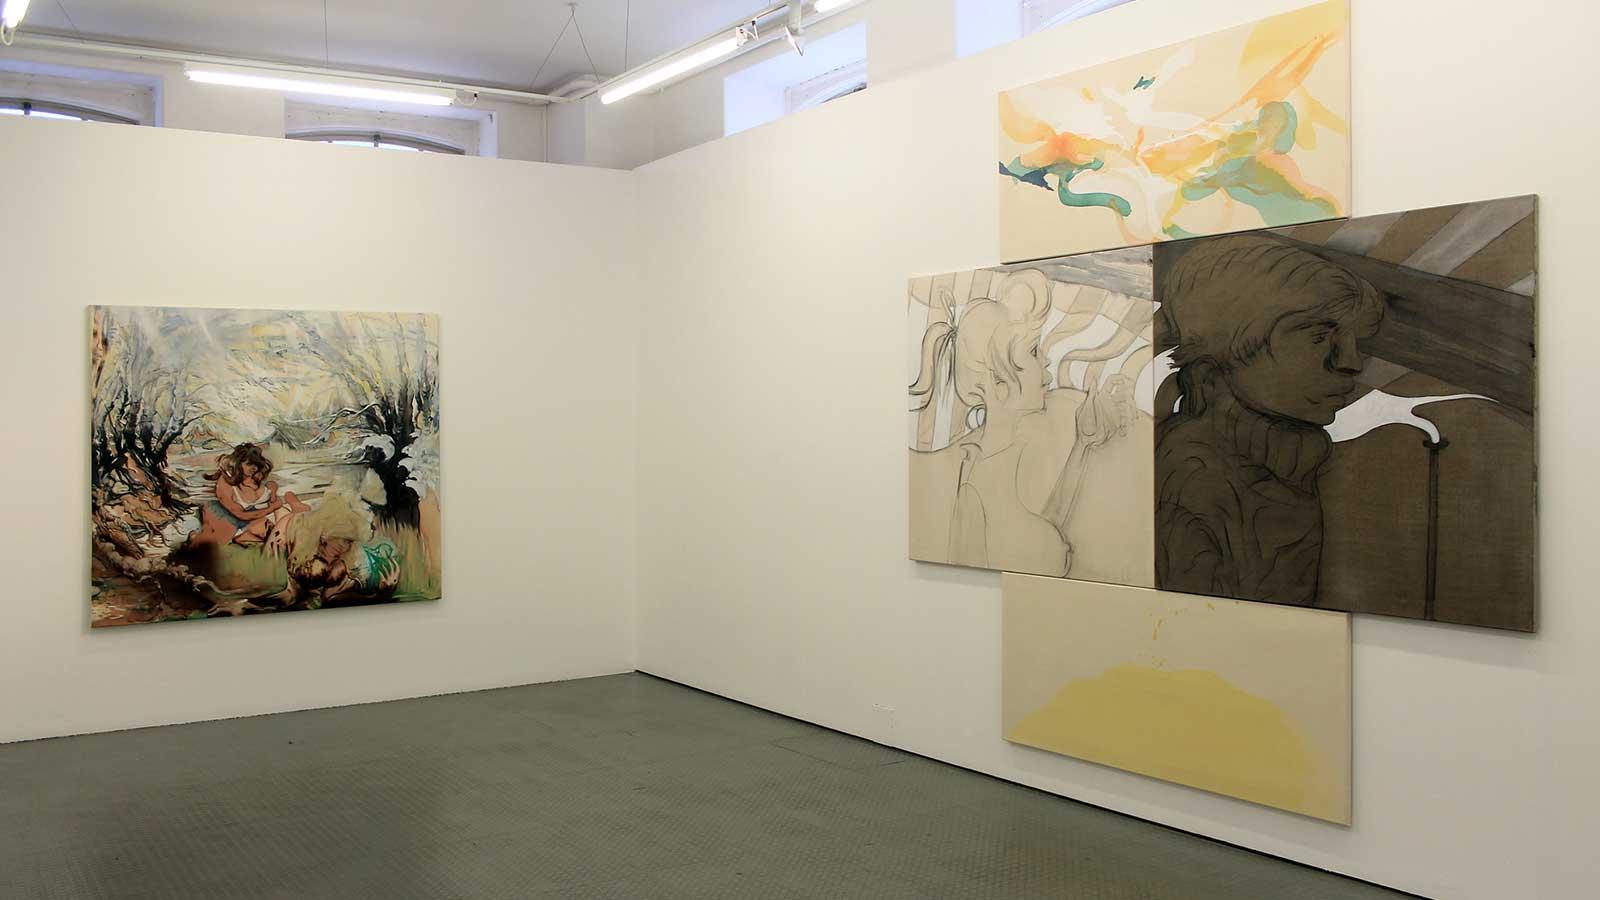 A photograph from Hannah Murgatroyd's exhibition.